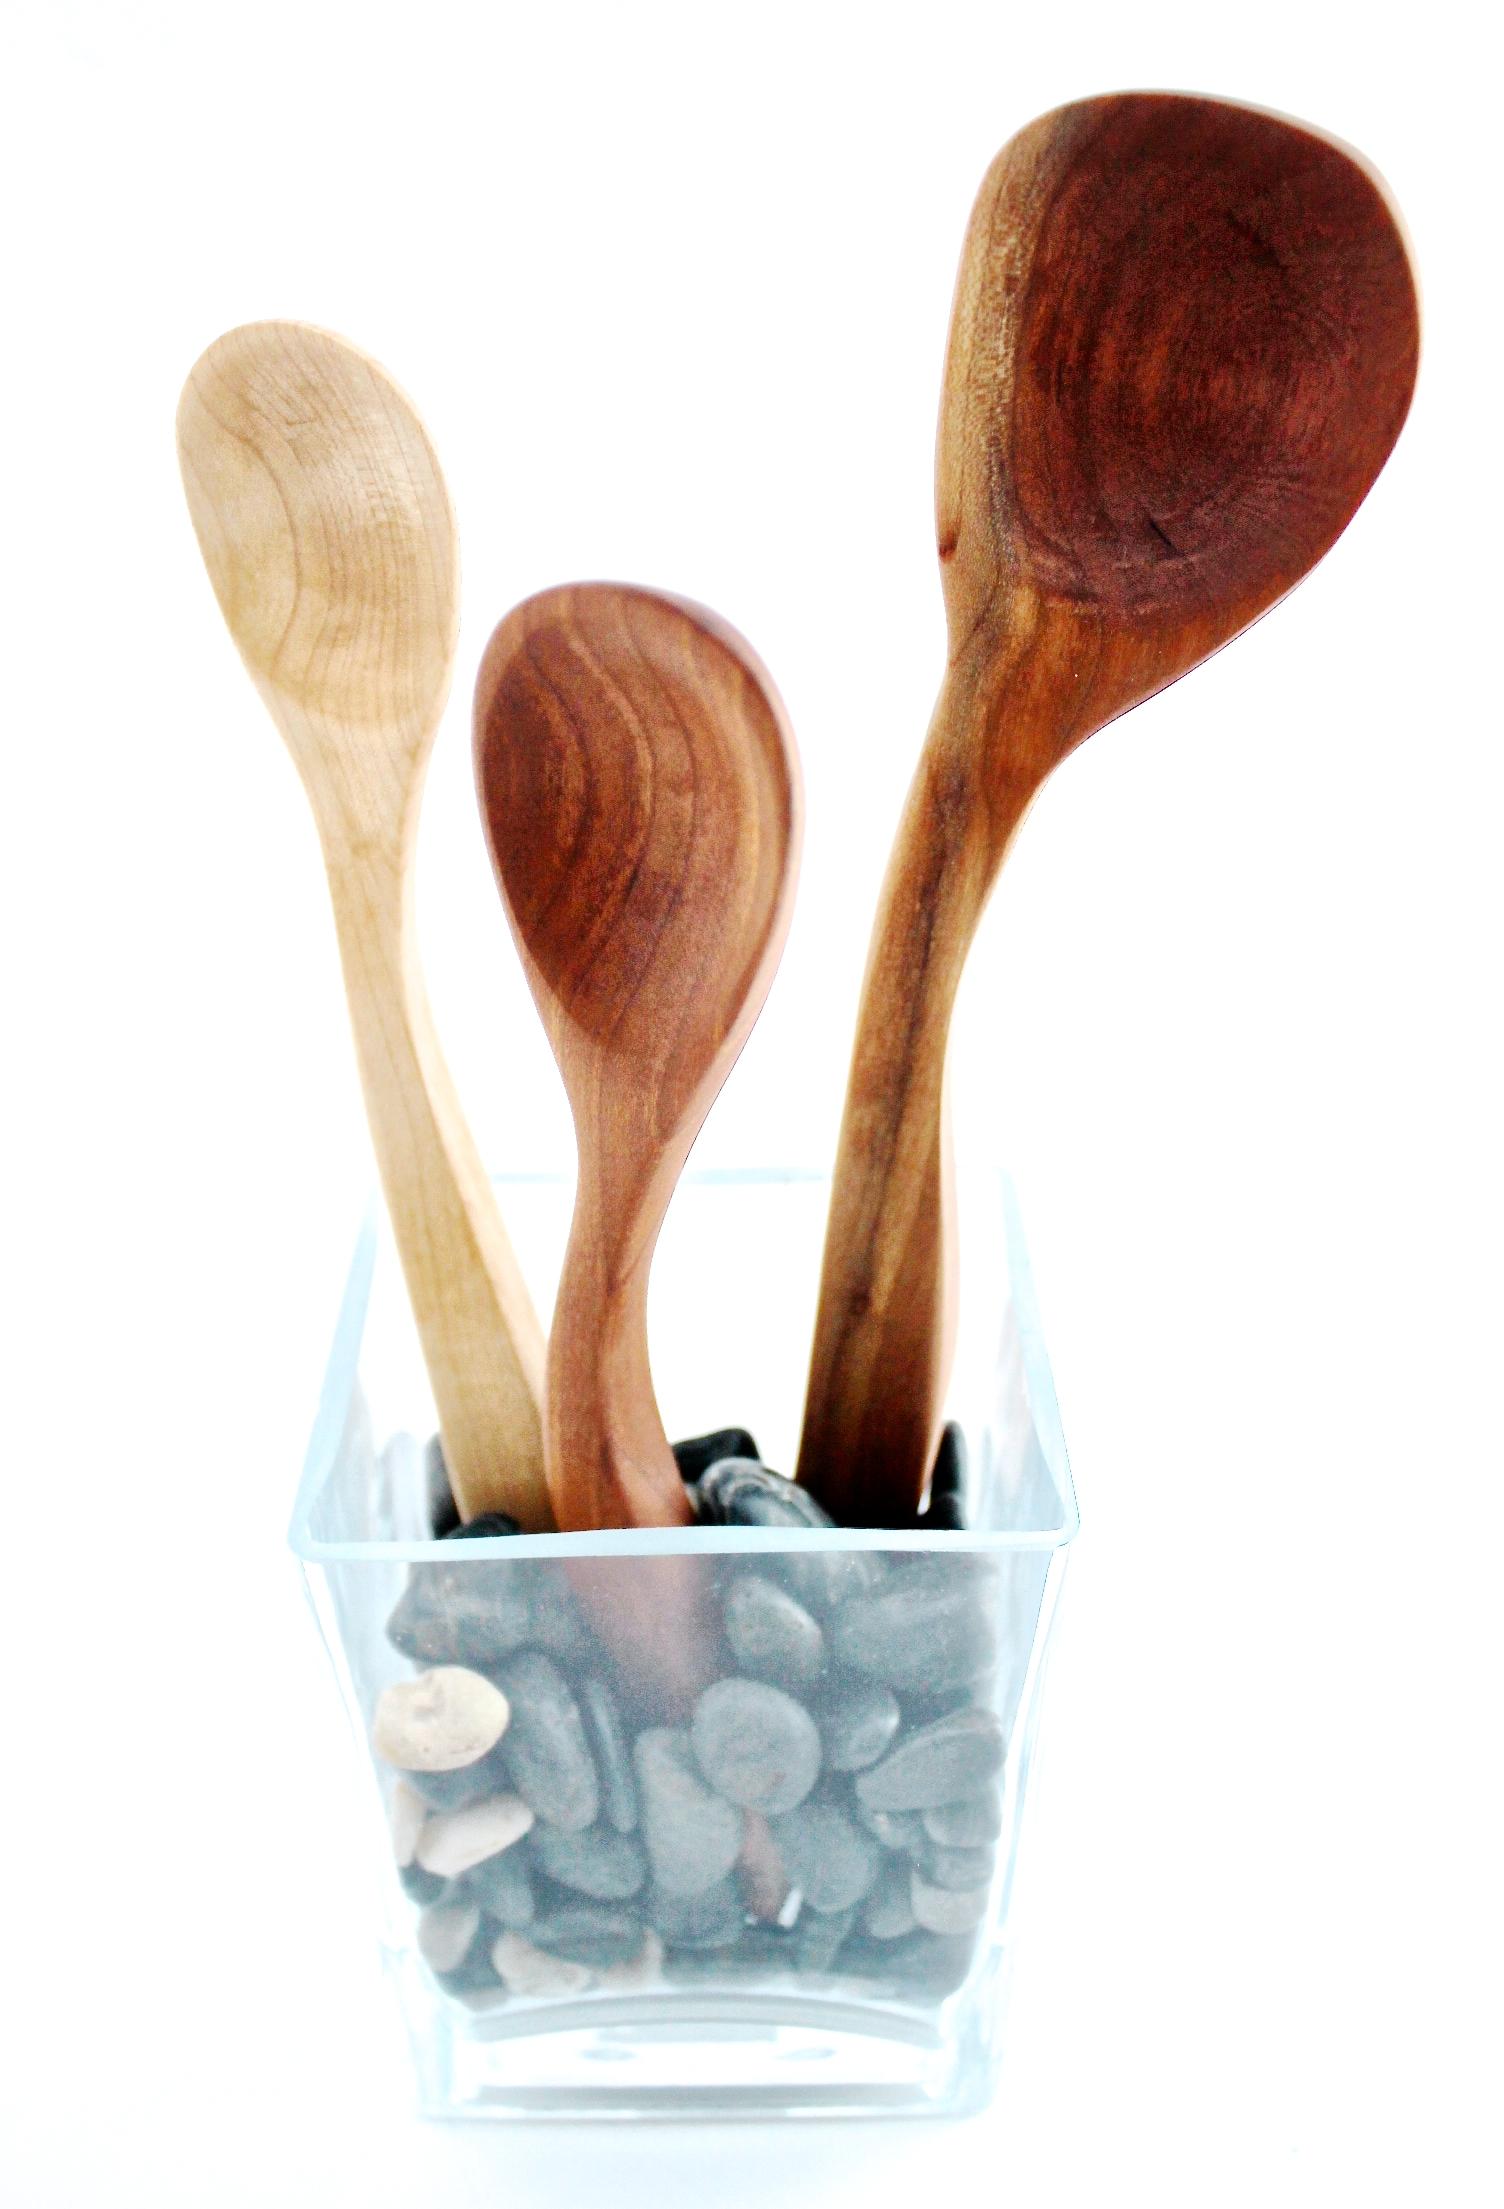 Wonky Spoons